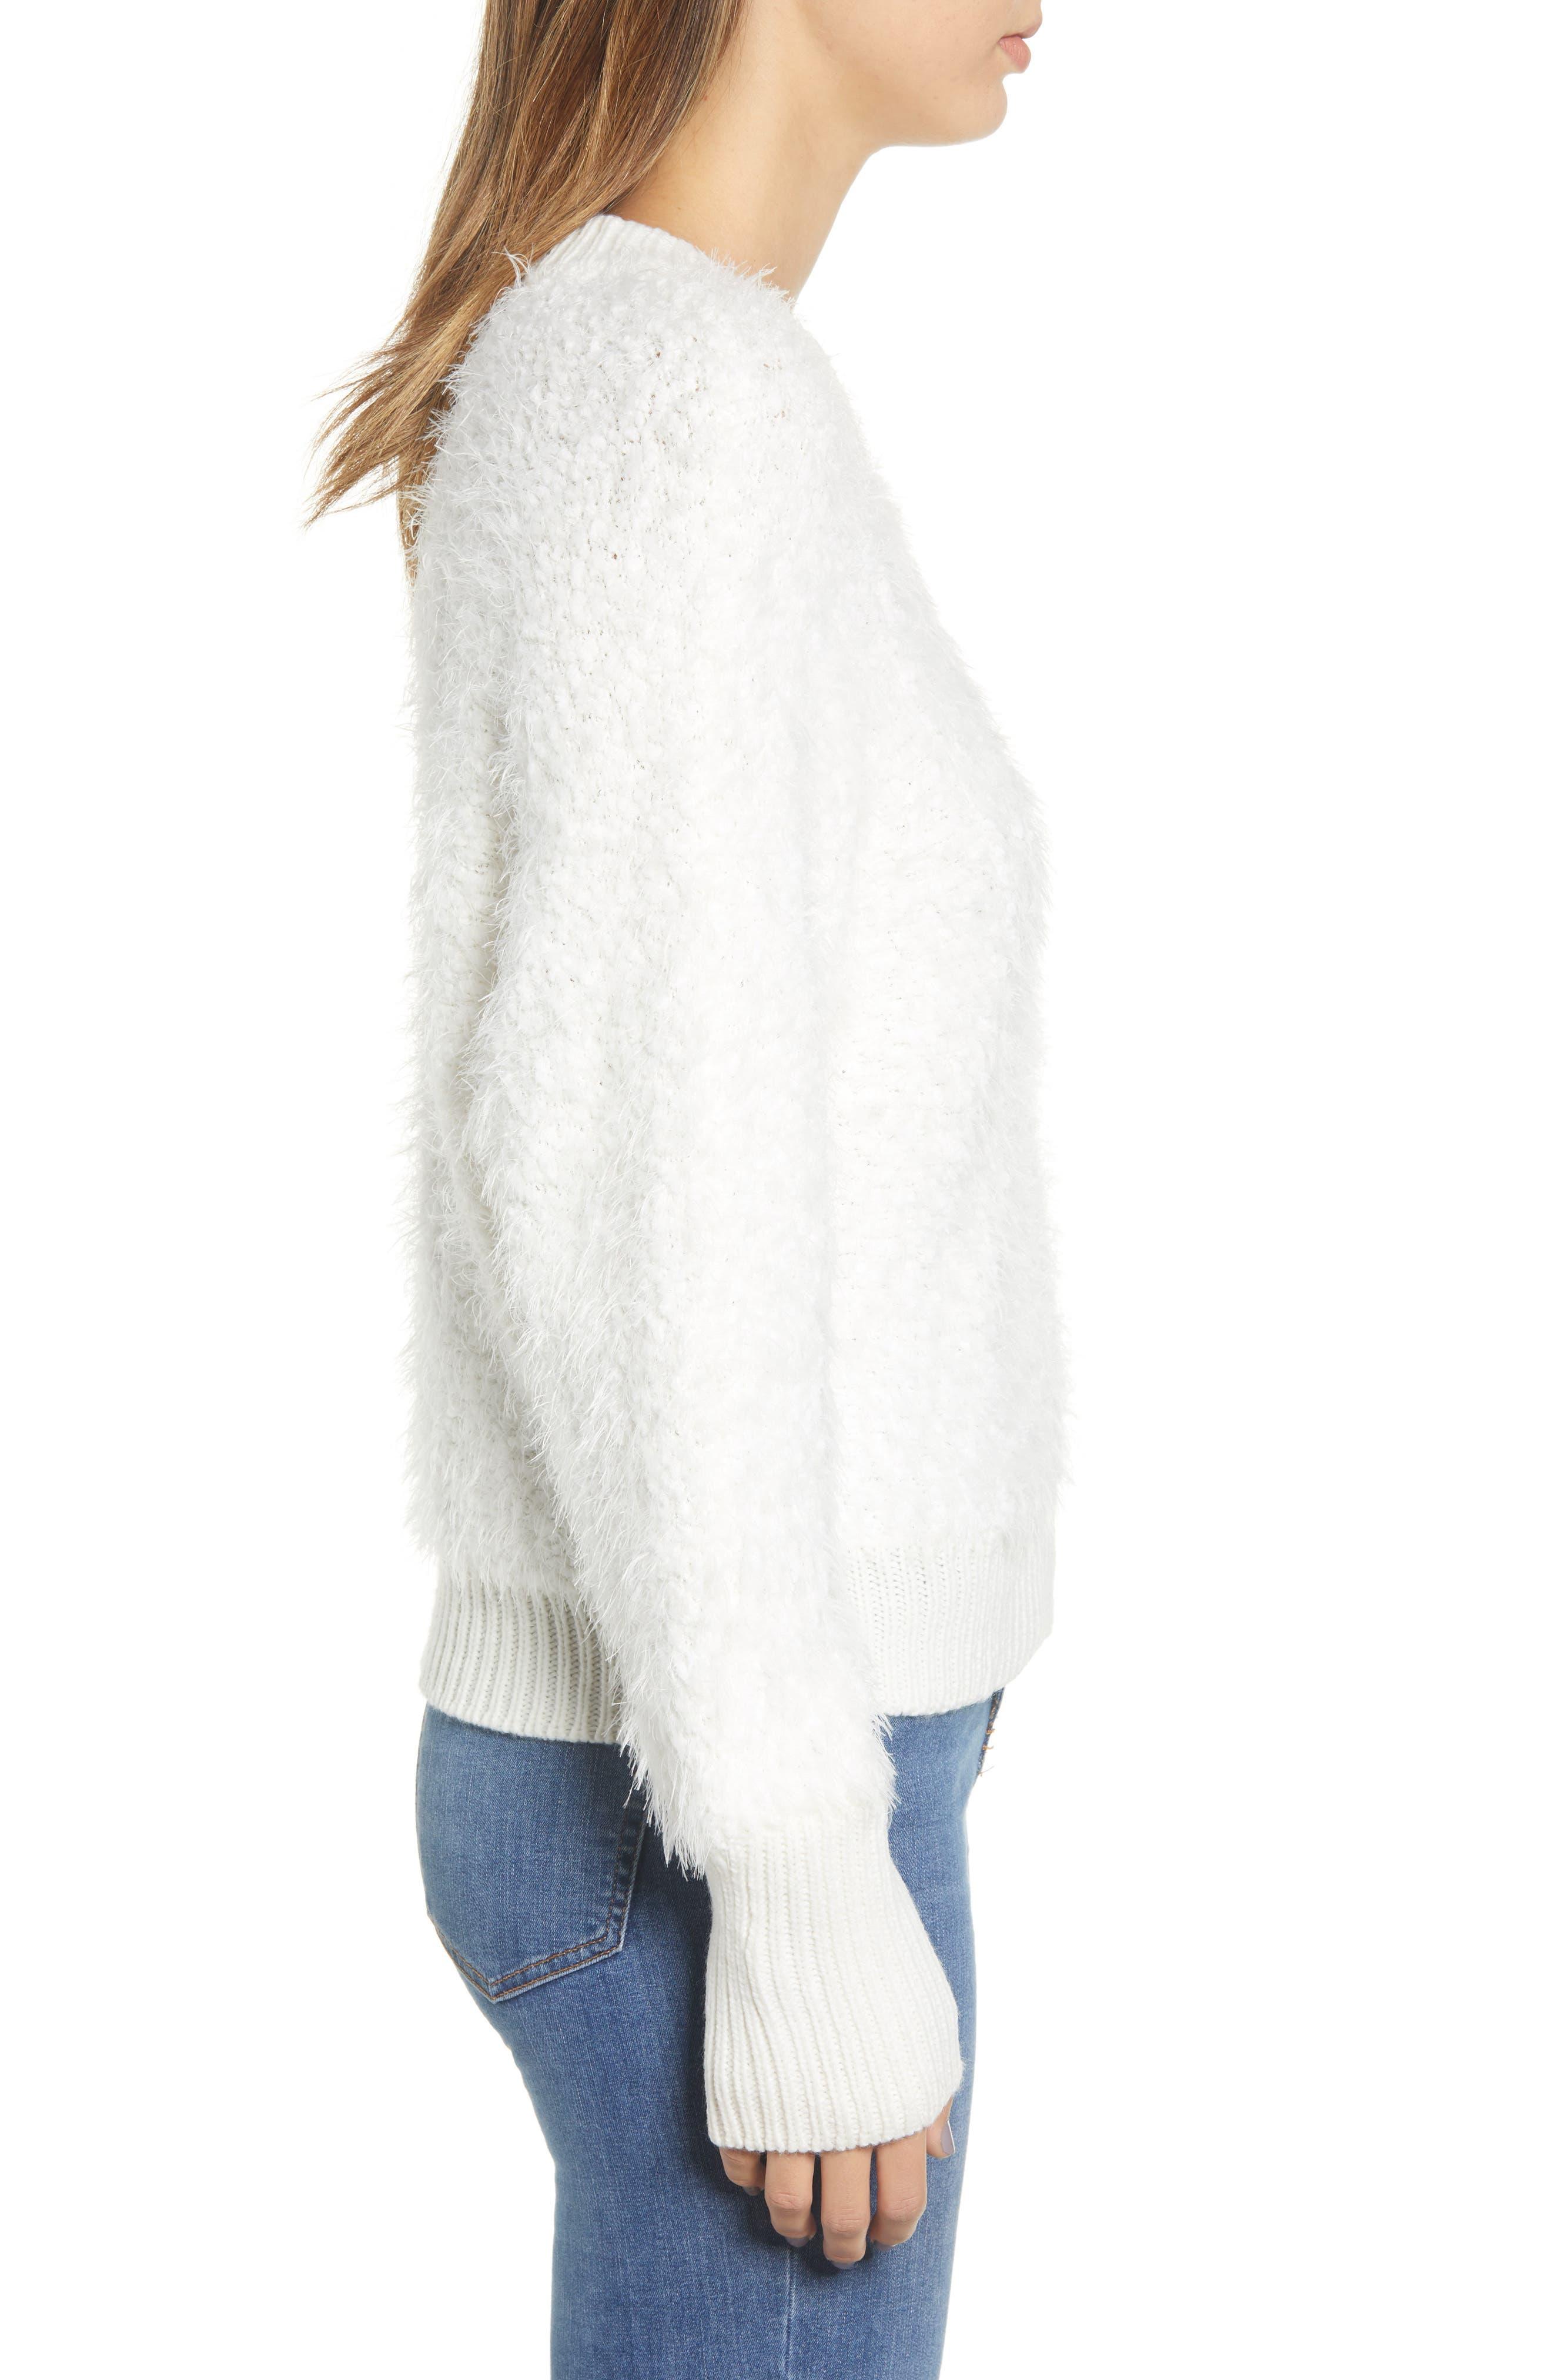 BP., Fluffy Dolman Sweater, Alternate thumbnail 3, color, 900